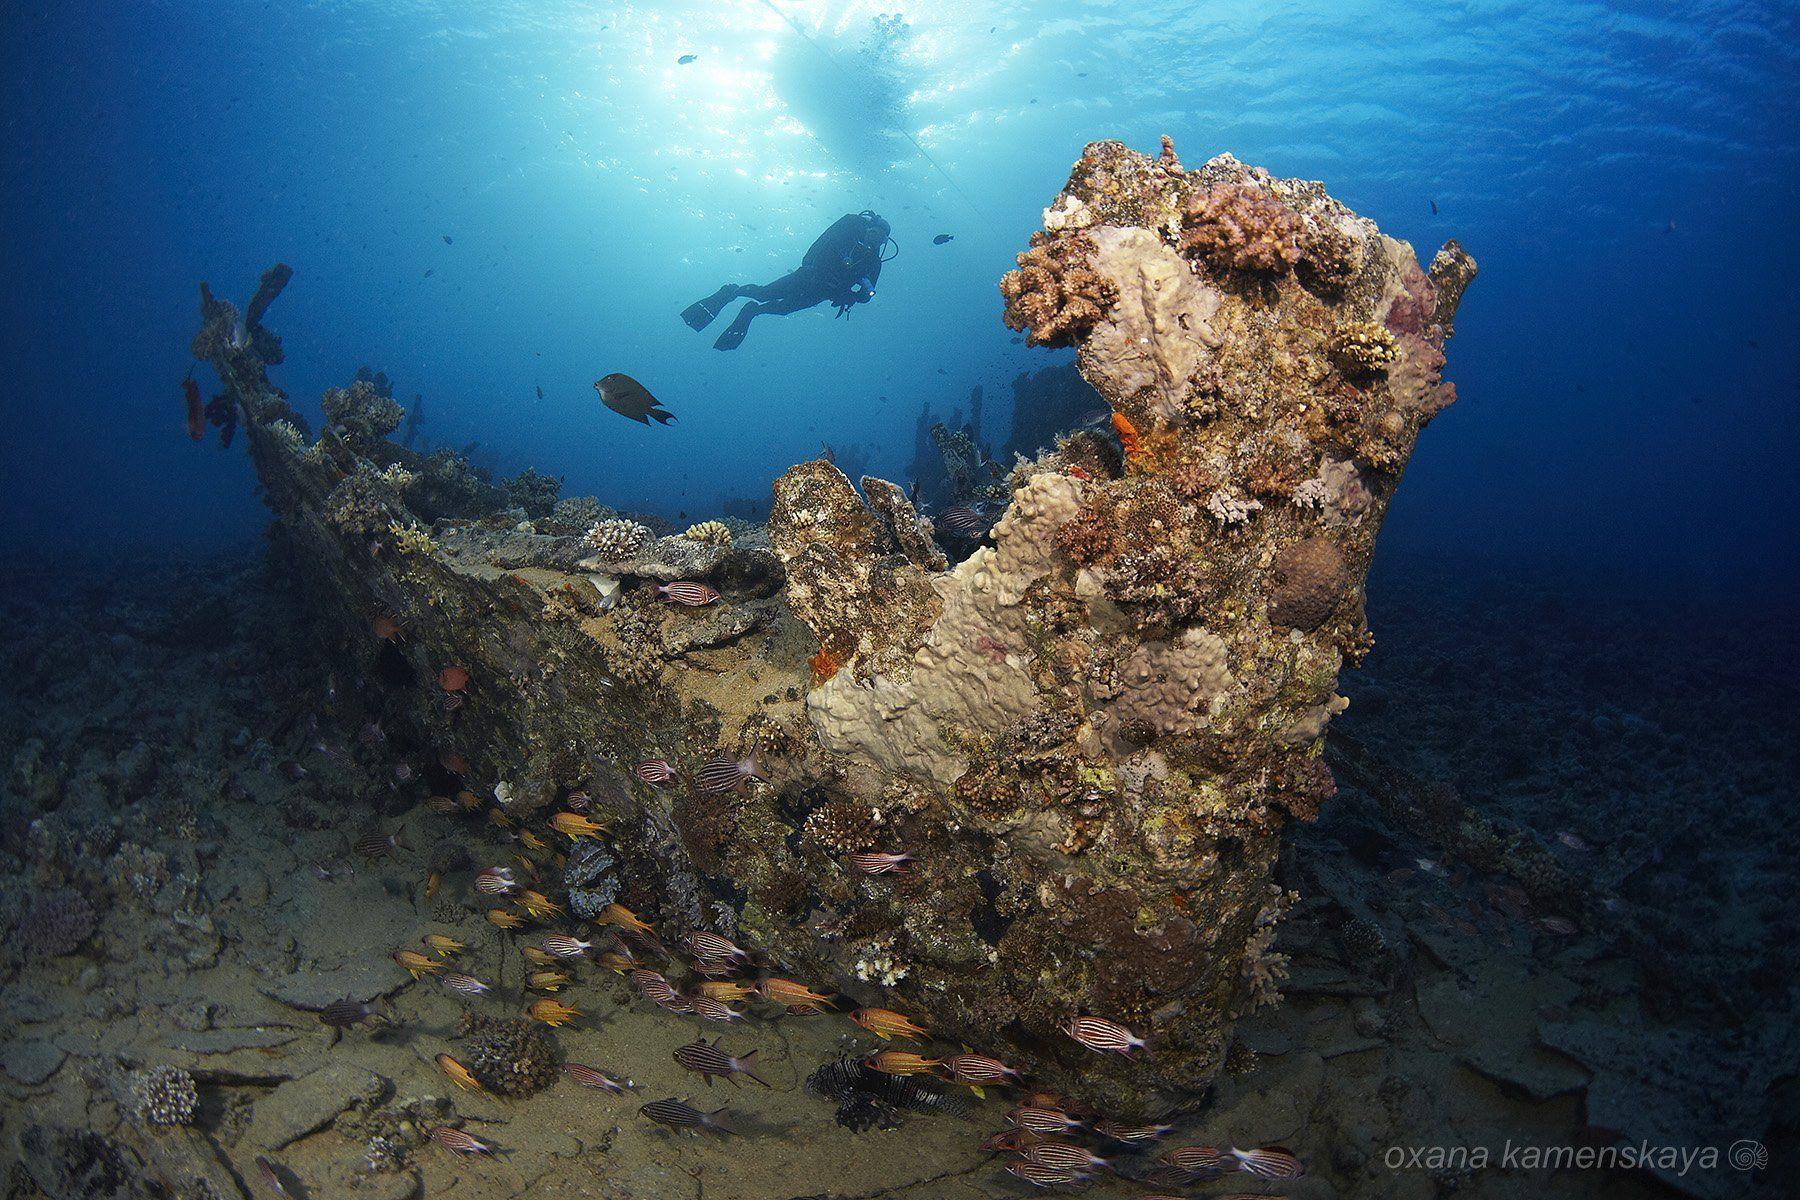 underwater blue fish coral wreck diver, Оксана Каменская